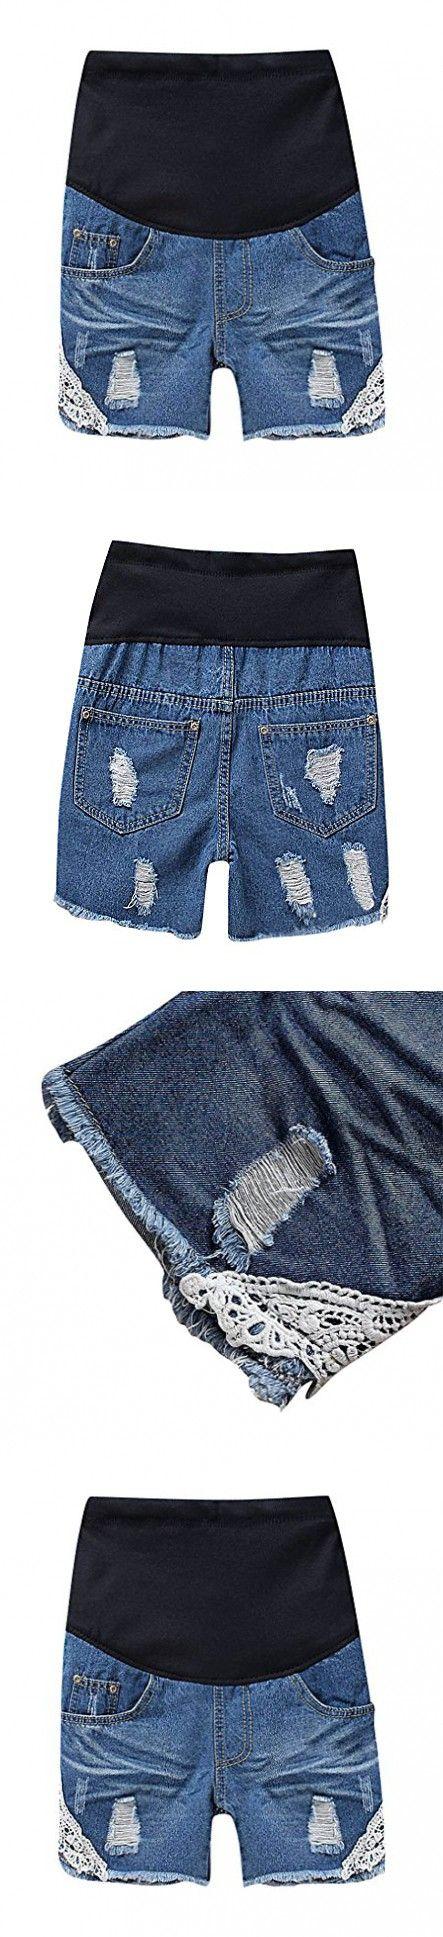 MIAMAMA Women's Maternity Elastic Waist Denim Shorts Summer White Lace Jeans, X-Large